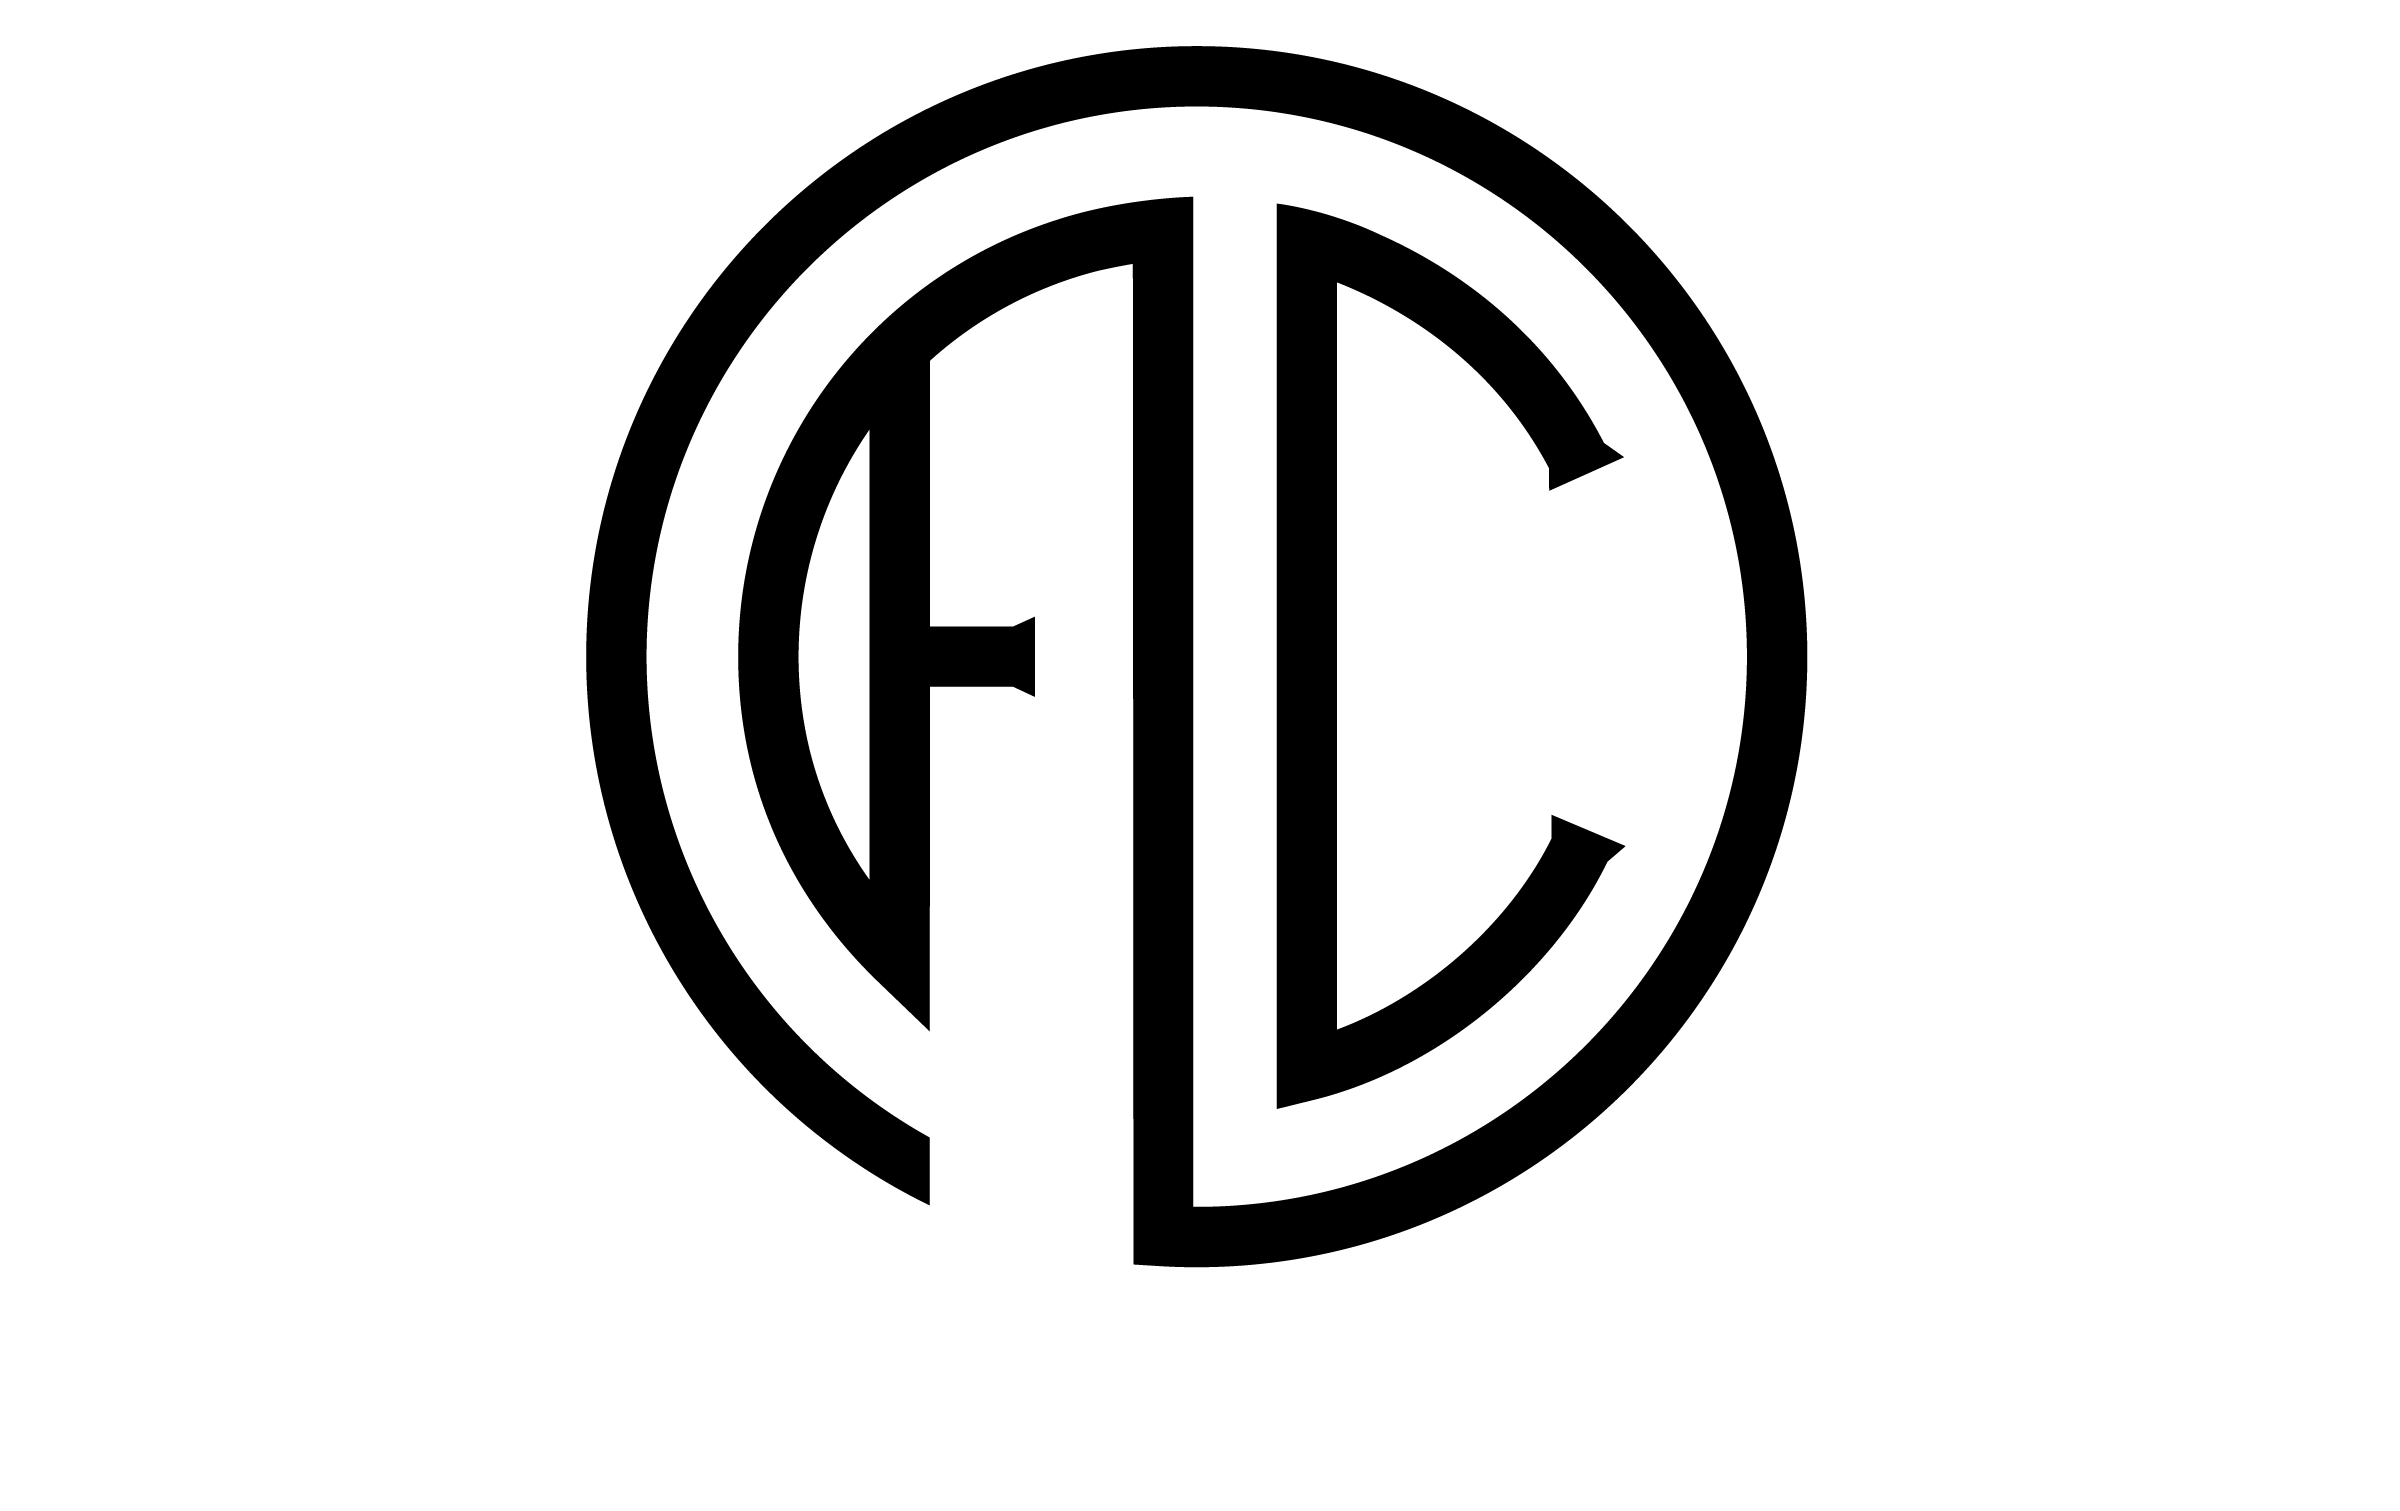 fLC_logo_black_Artboard 5.png